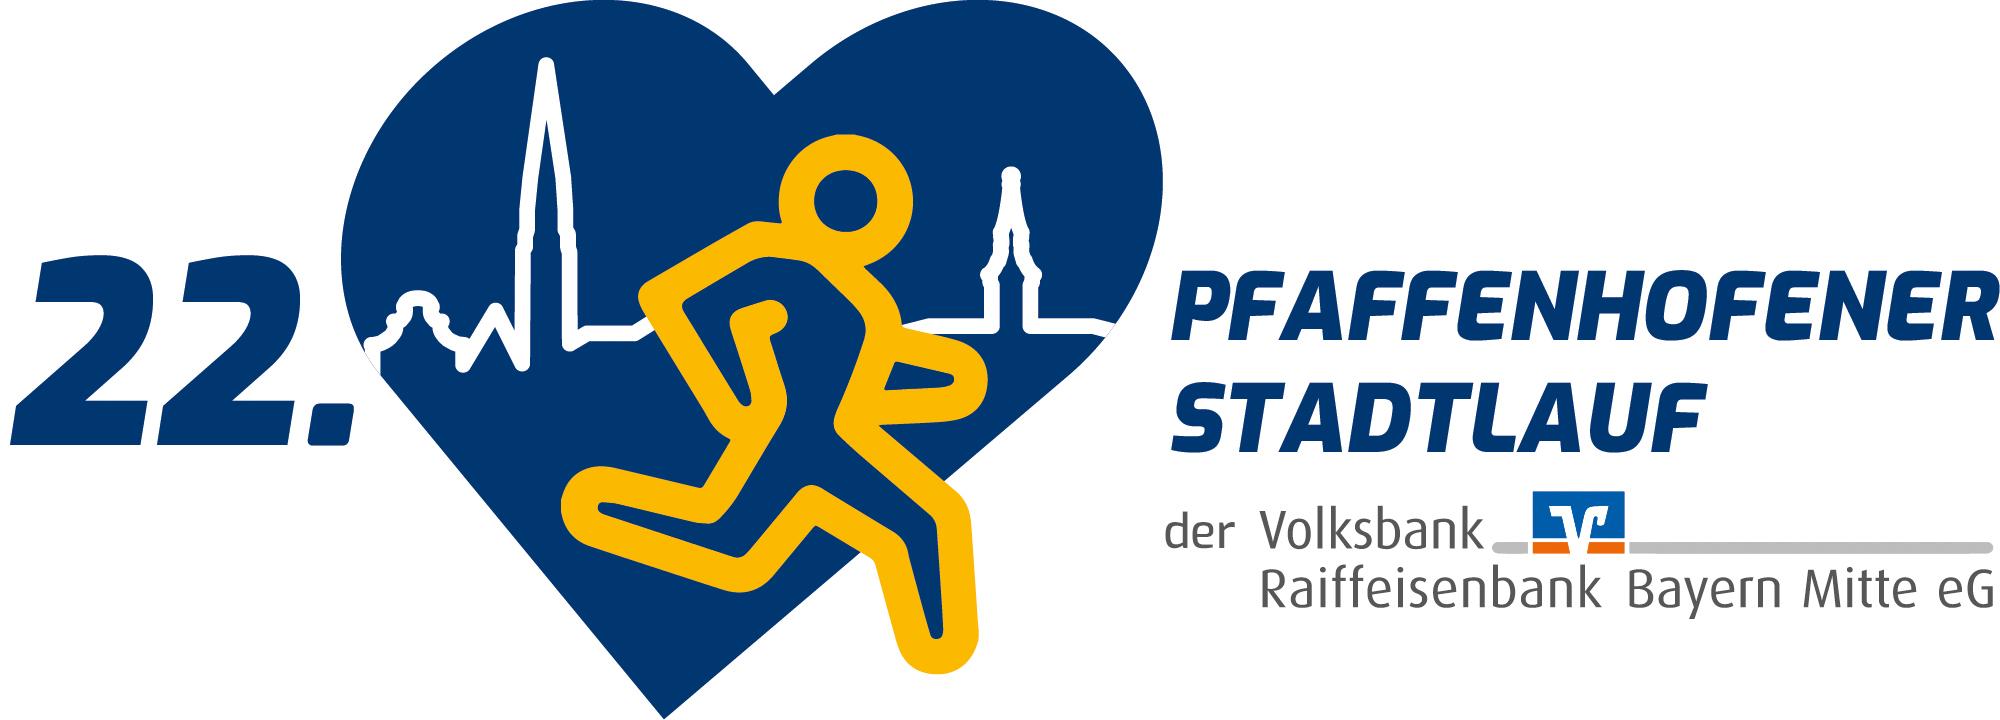 Ausdauersport Förderverein Pfaffenhofen e.v.